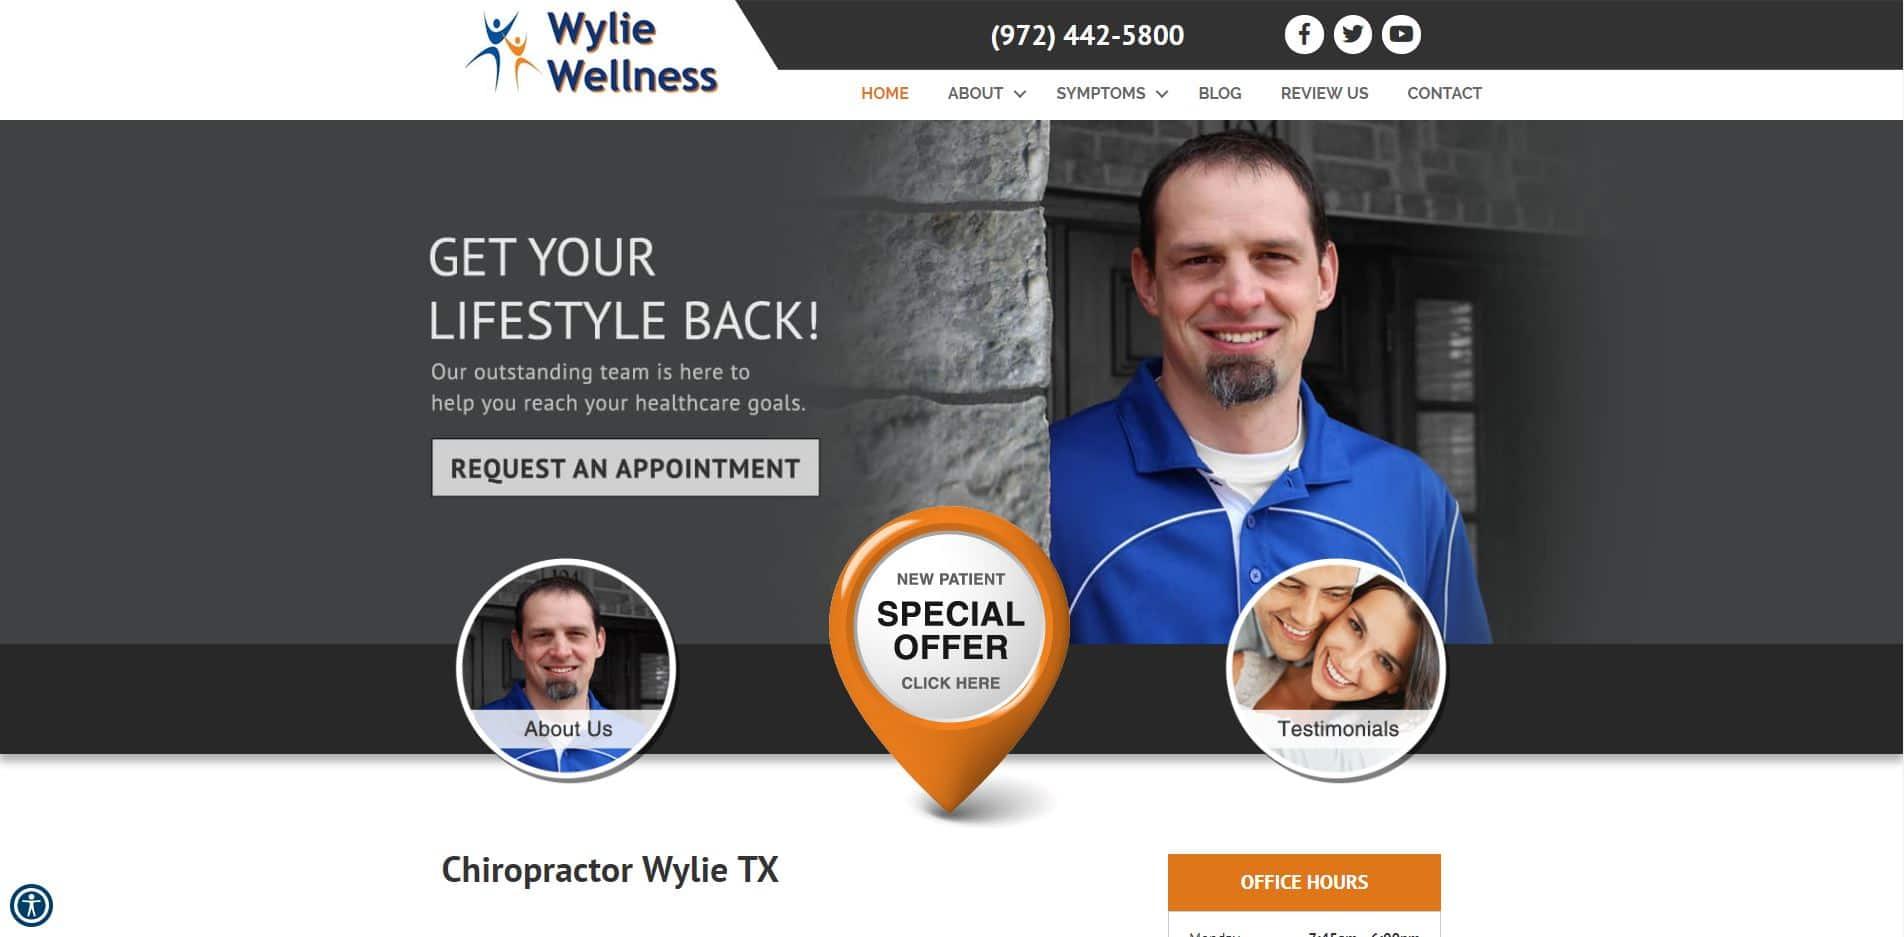 Chiropractor in Wylie